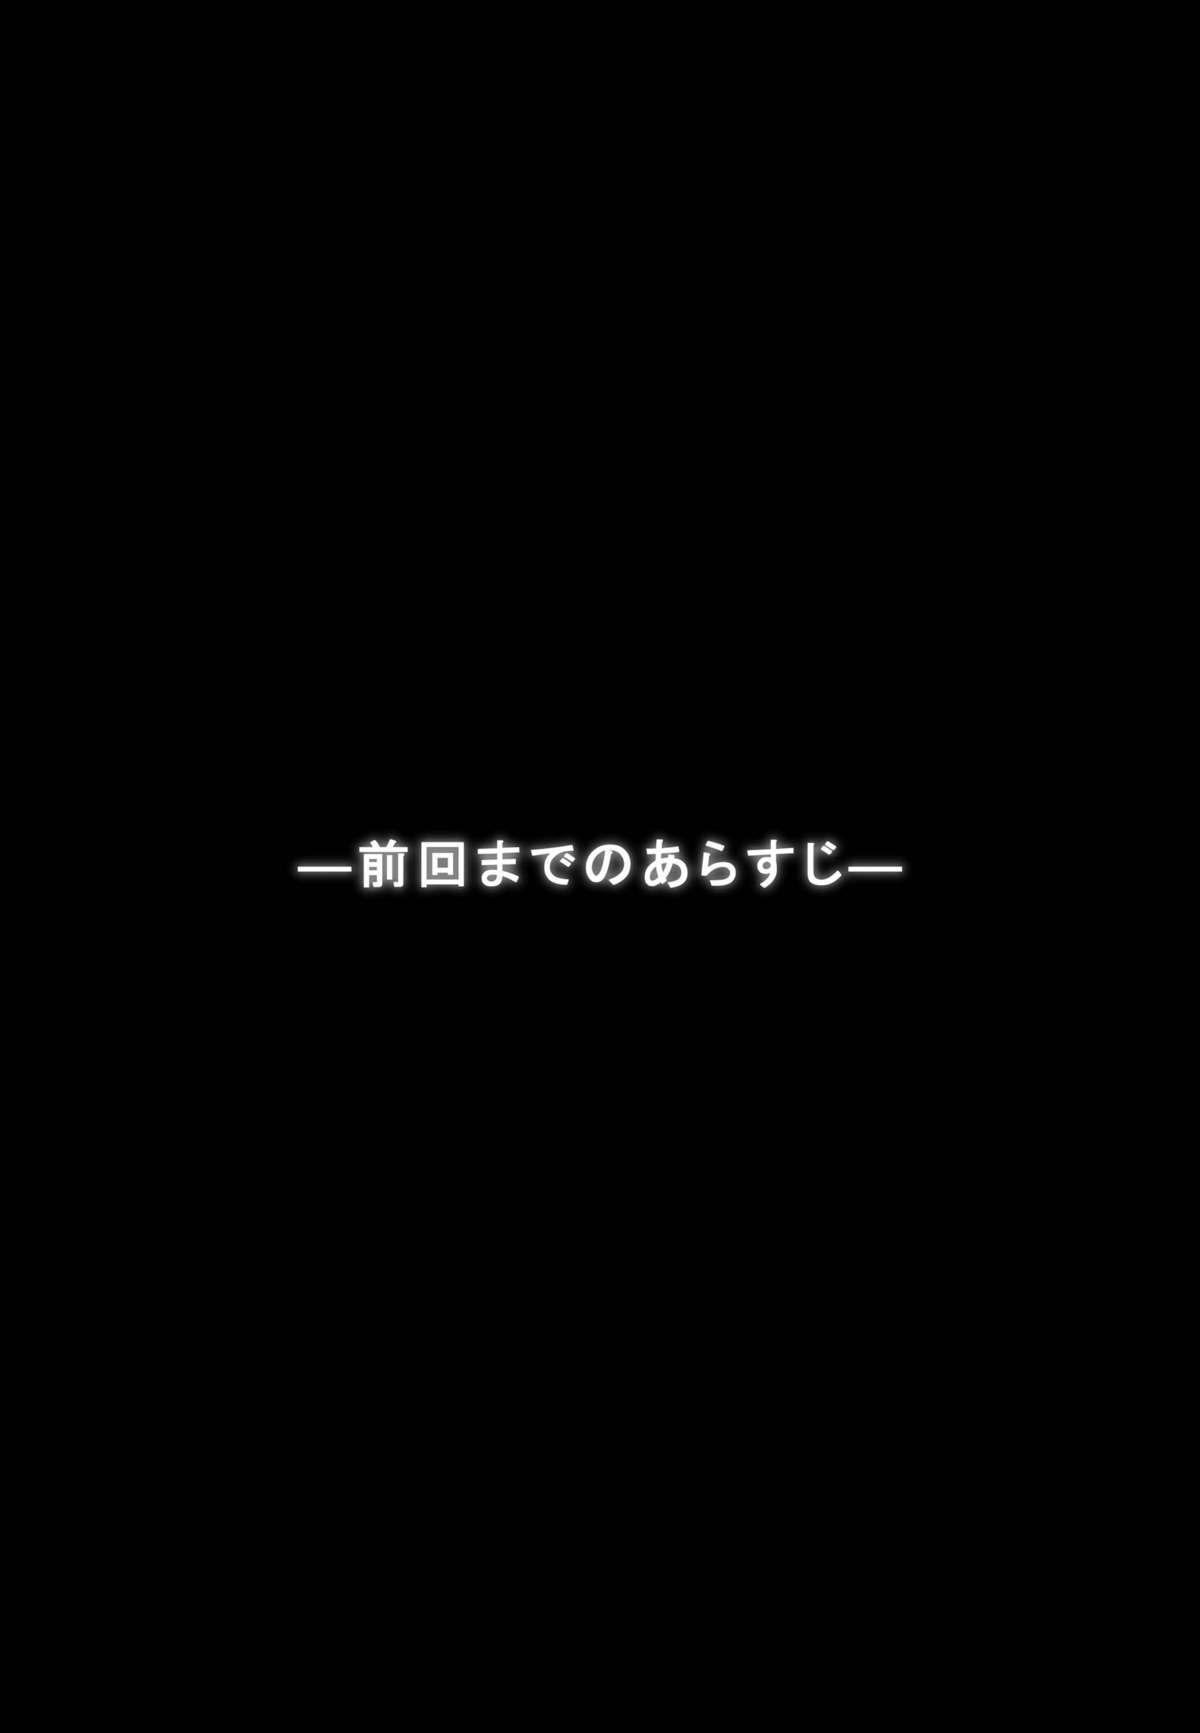 [Macxe's (monmon)] Tokubousentai Dinaranger ~Heroine Kairaku Sennou Keikaku~ Vol.01/02/03 (Renkaban) [Digital] 118